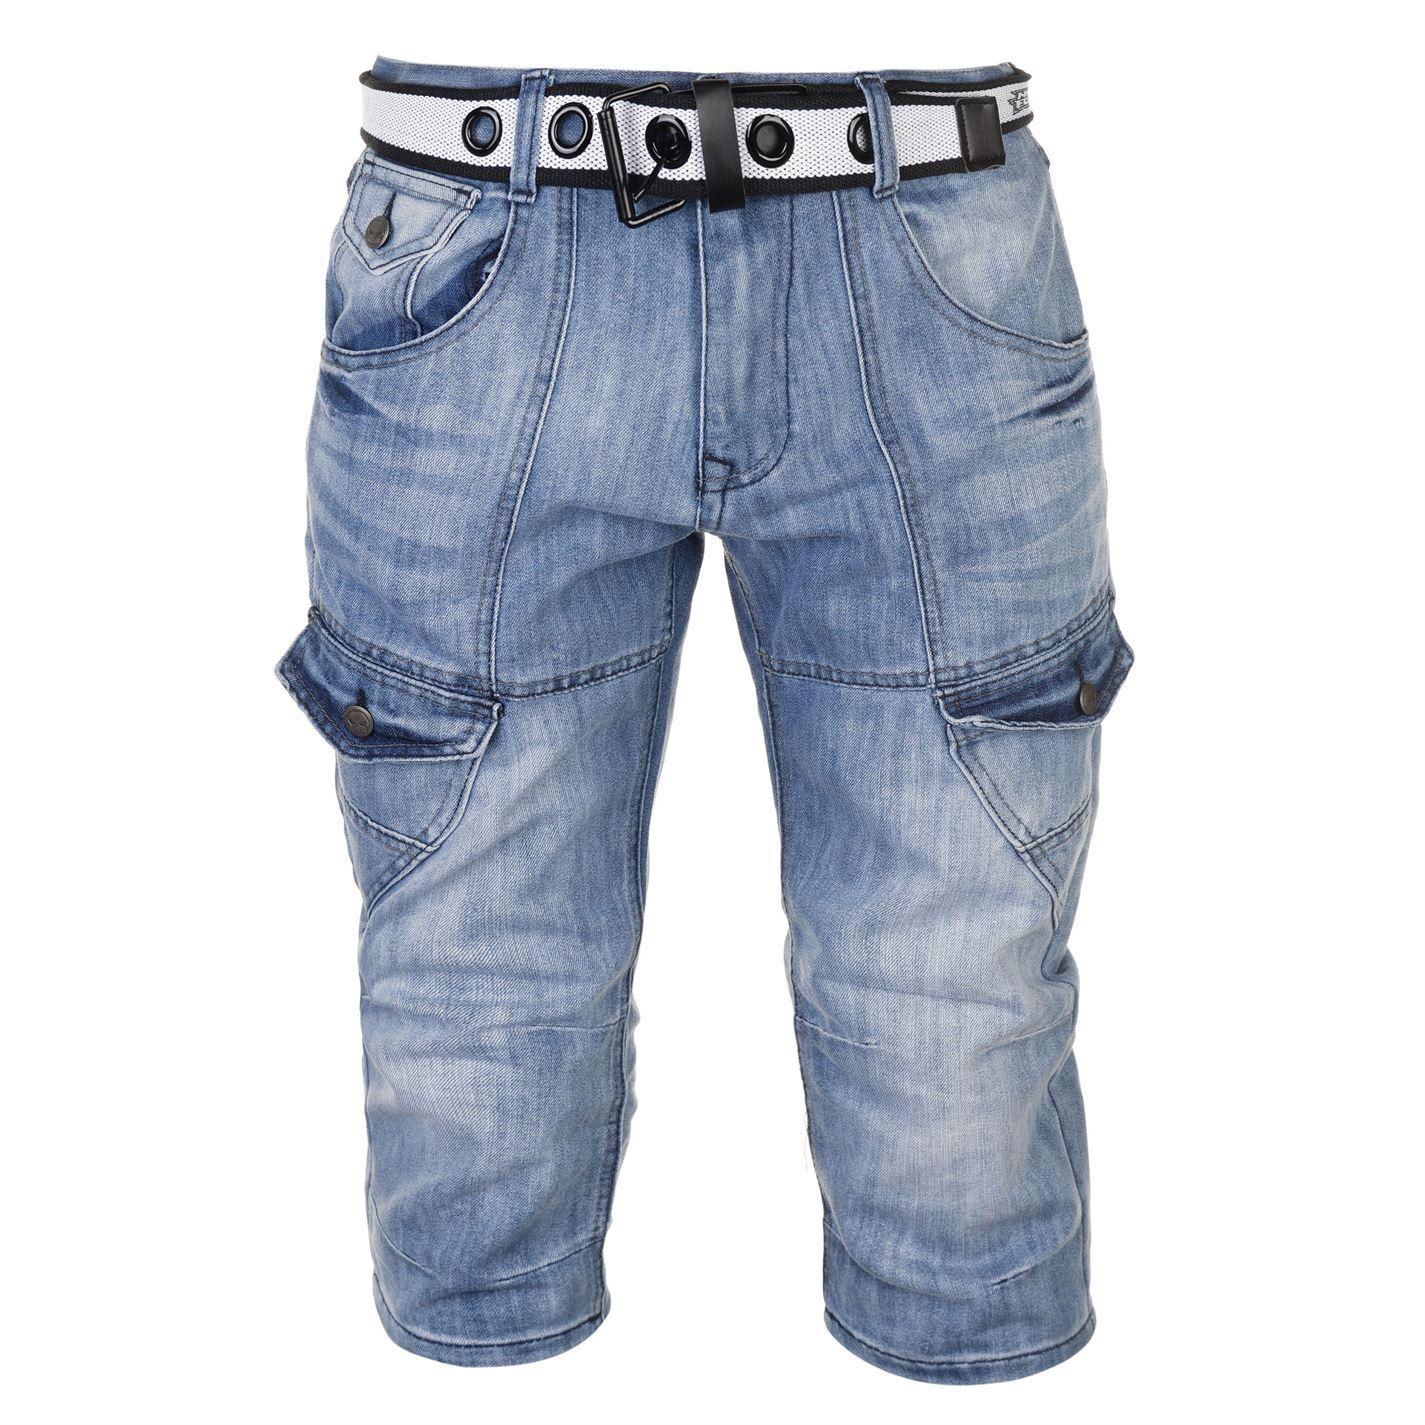 No-Fear-Belted-Cargo-Shorts-Mens-Bottoms-Short-Pants-Summerwear thumbnail 13